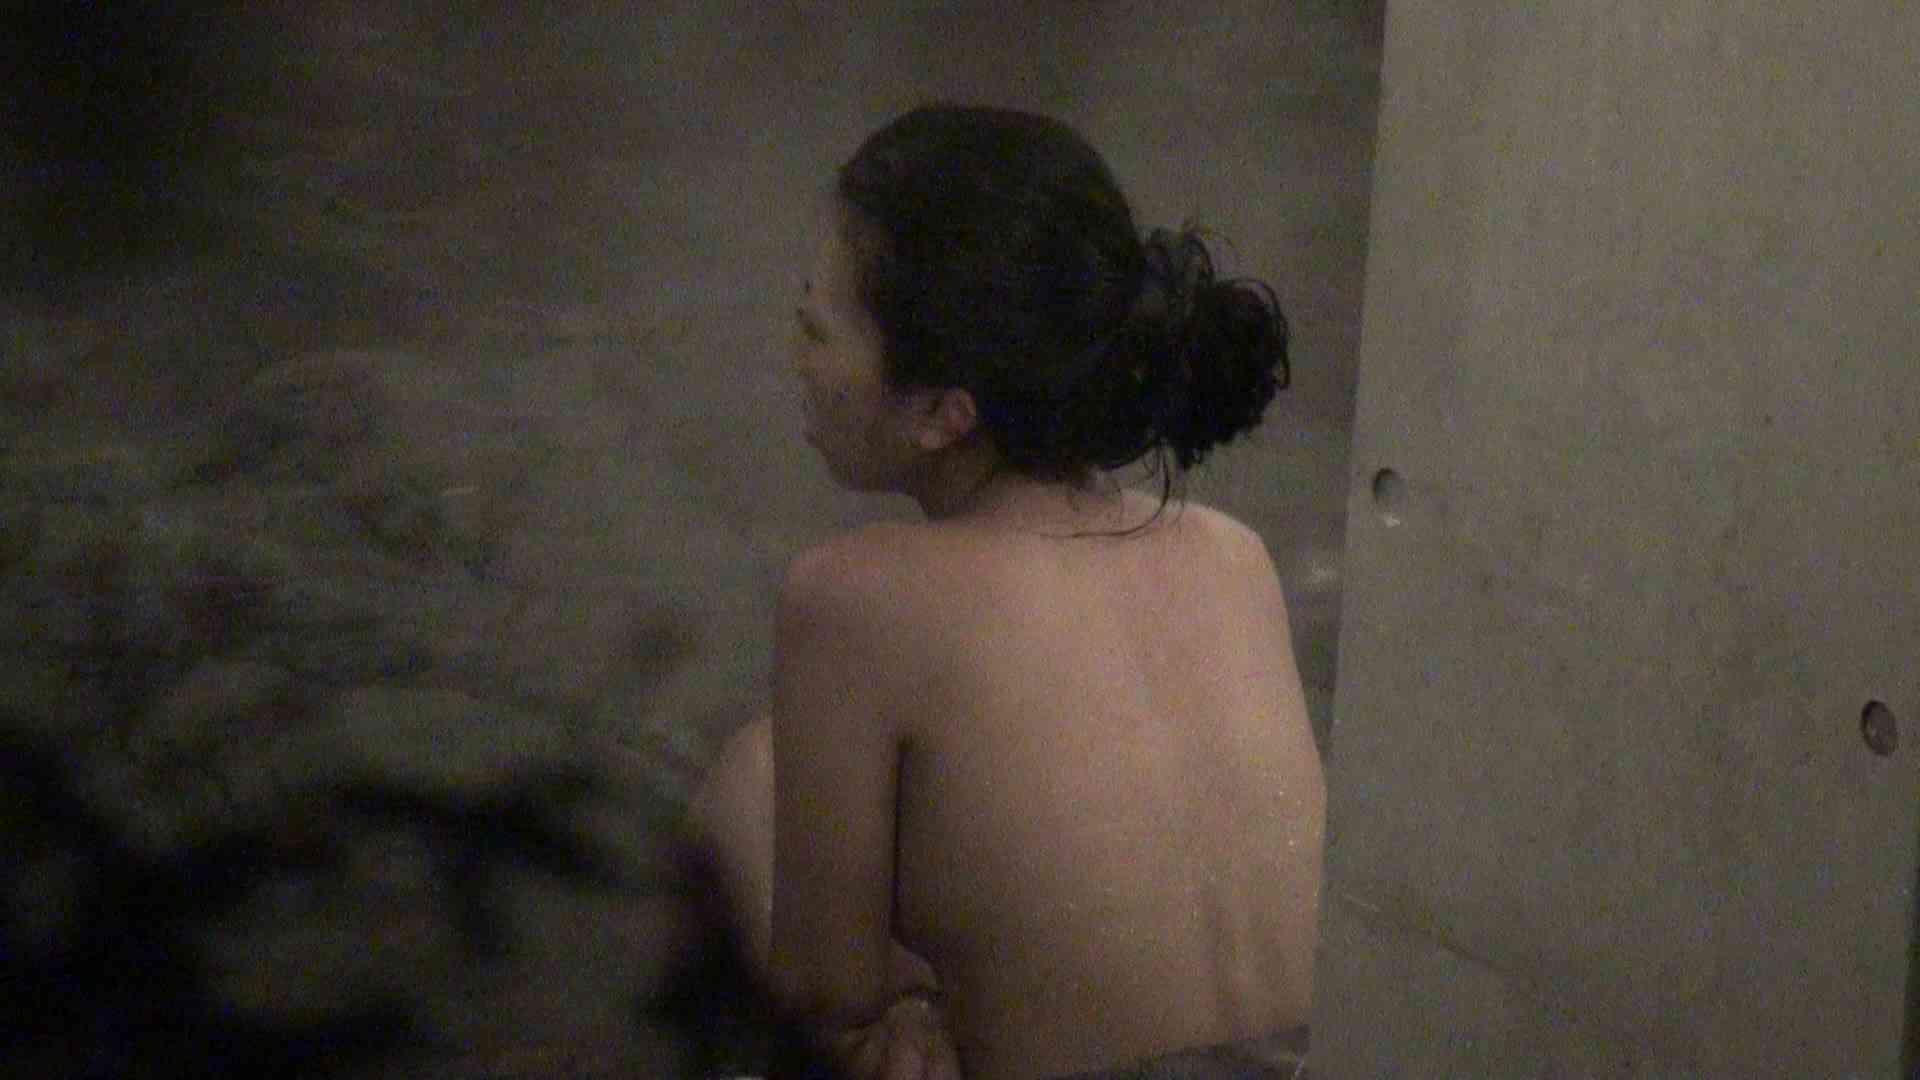 Aquaな露天風呂Vol.375 露天 盗撮セックス無修正動画無料 106連発 47